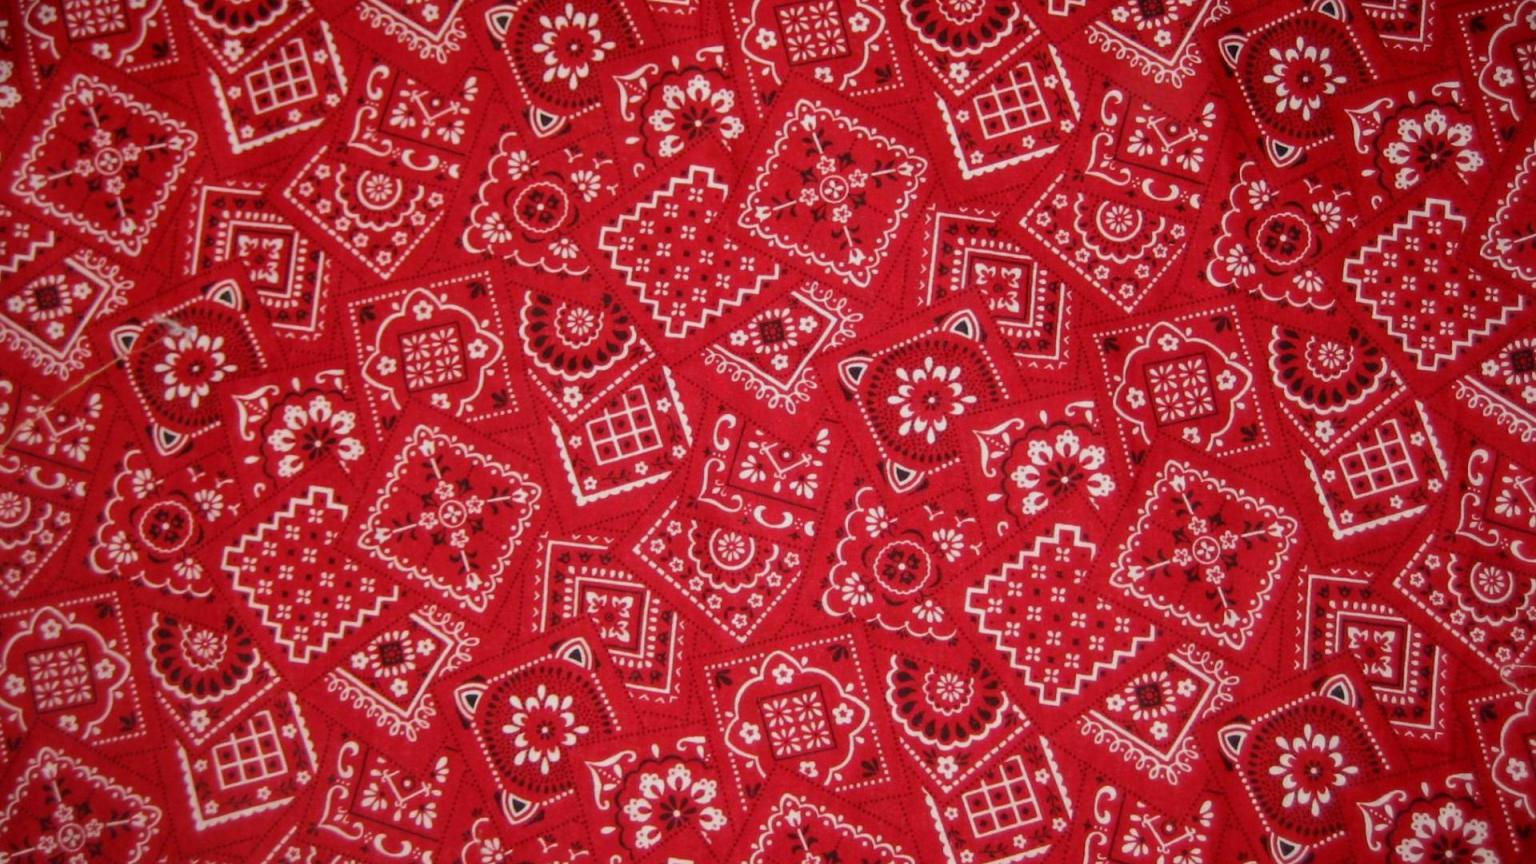 Creative Bandana Source 1920x1523px Red Wallpaper WallpaperSafari